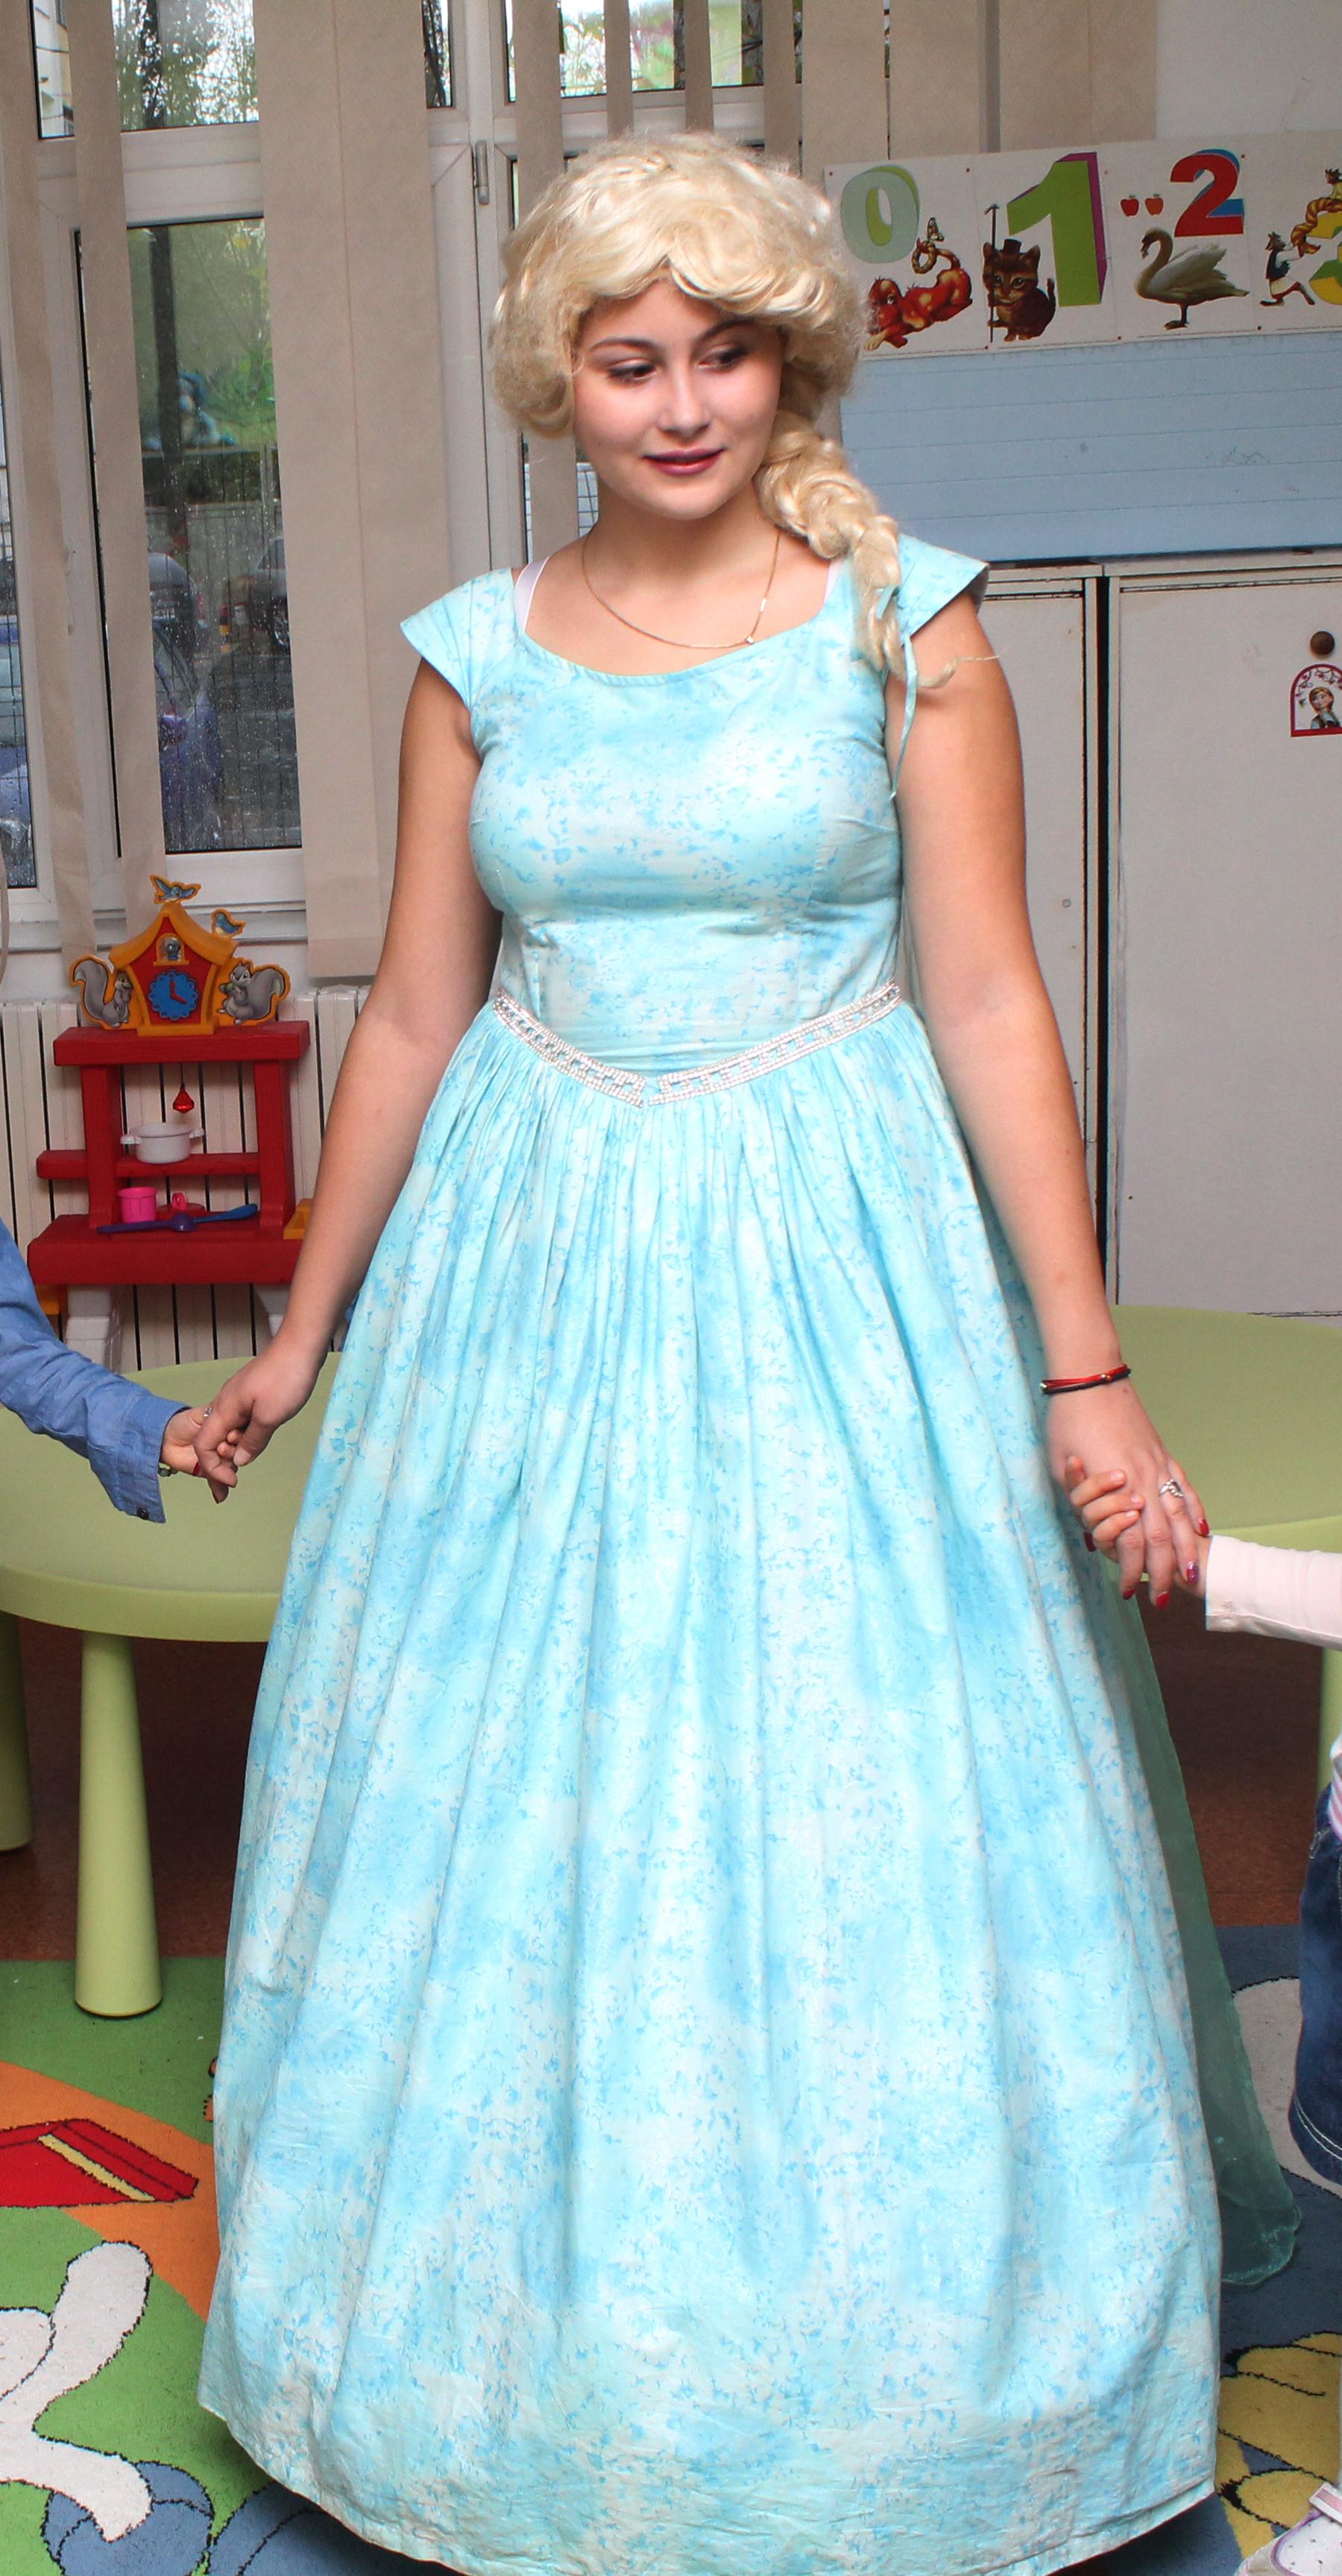 Elsa din regatul de gheata cu rochita noua